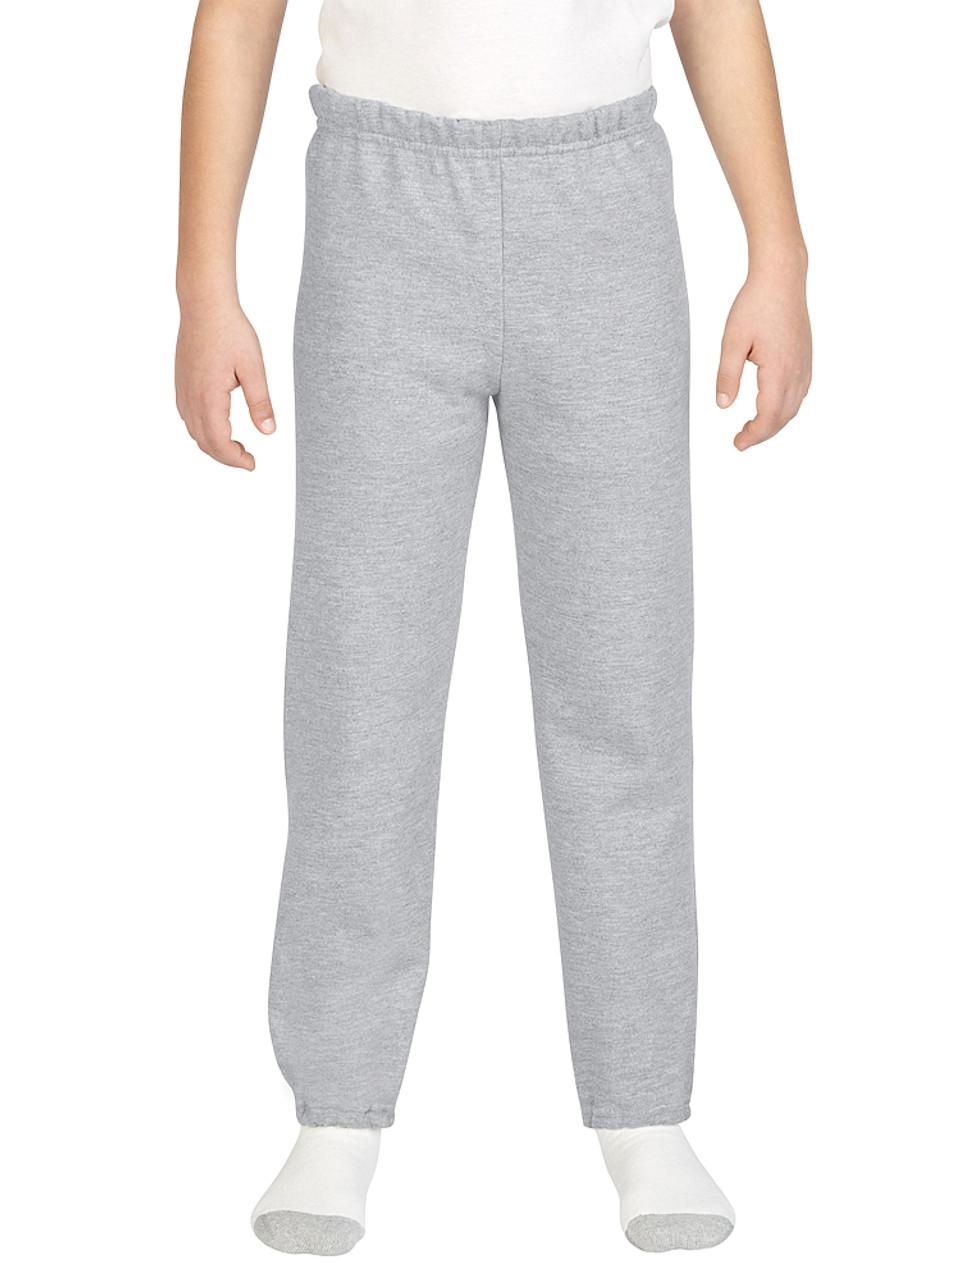 18200B Gildan Youth Heavy Blend Sweatpants   T-shirt.ca